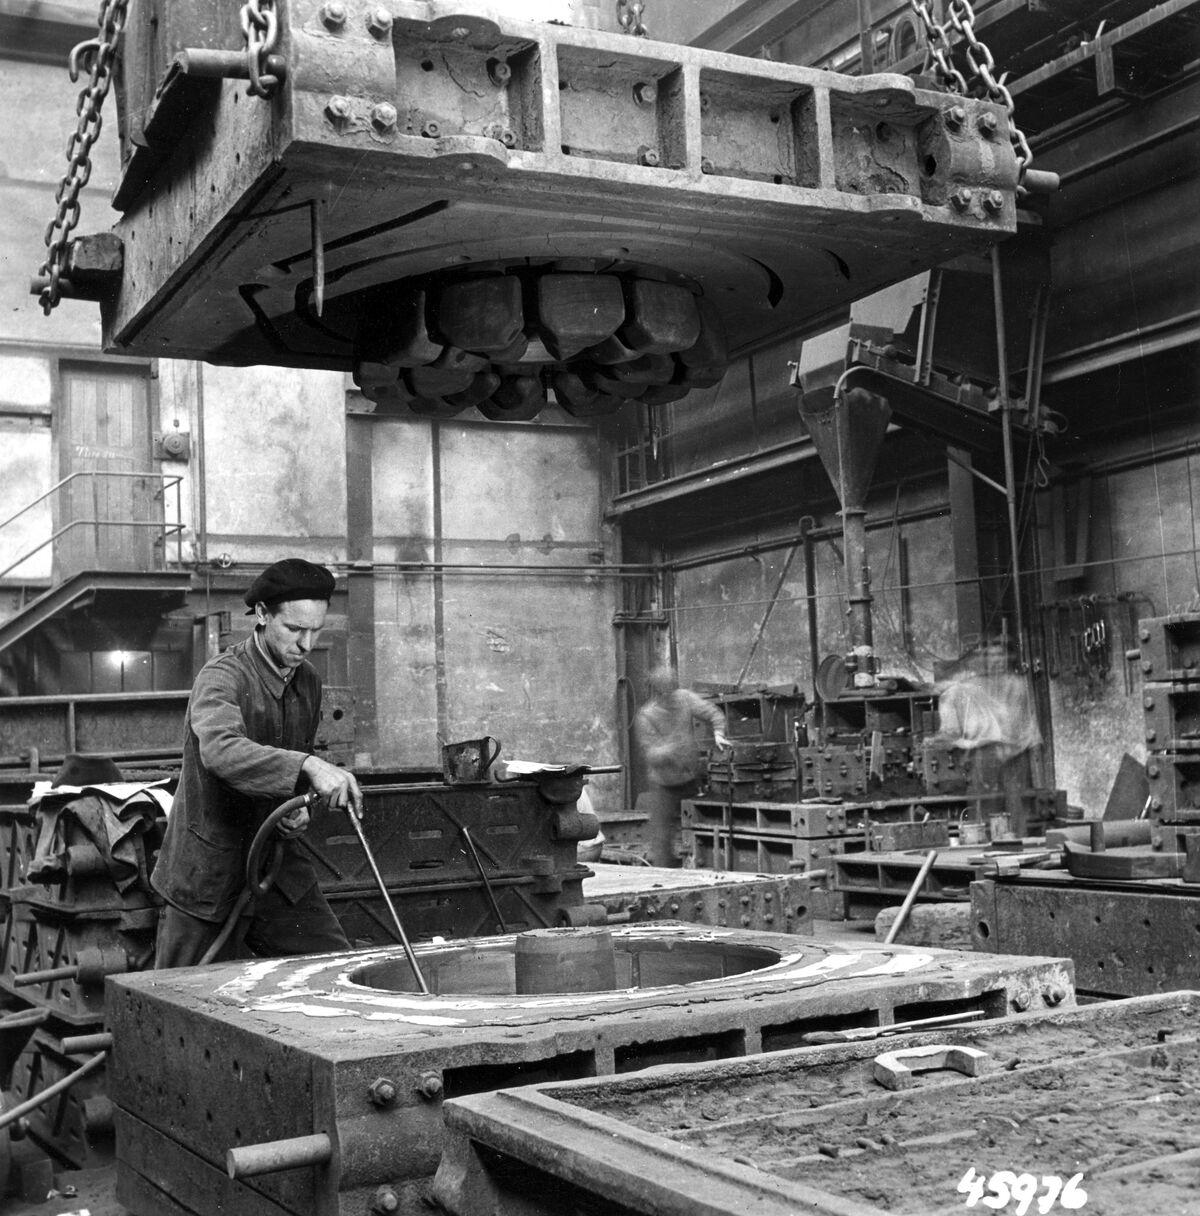 GFA 12/45976: Reportage casting process in malleable casting